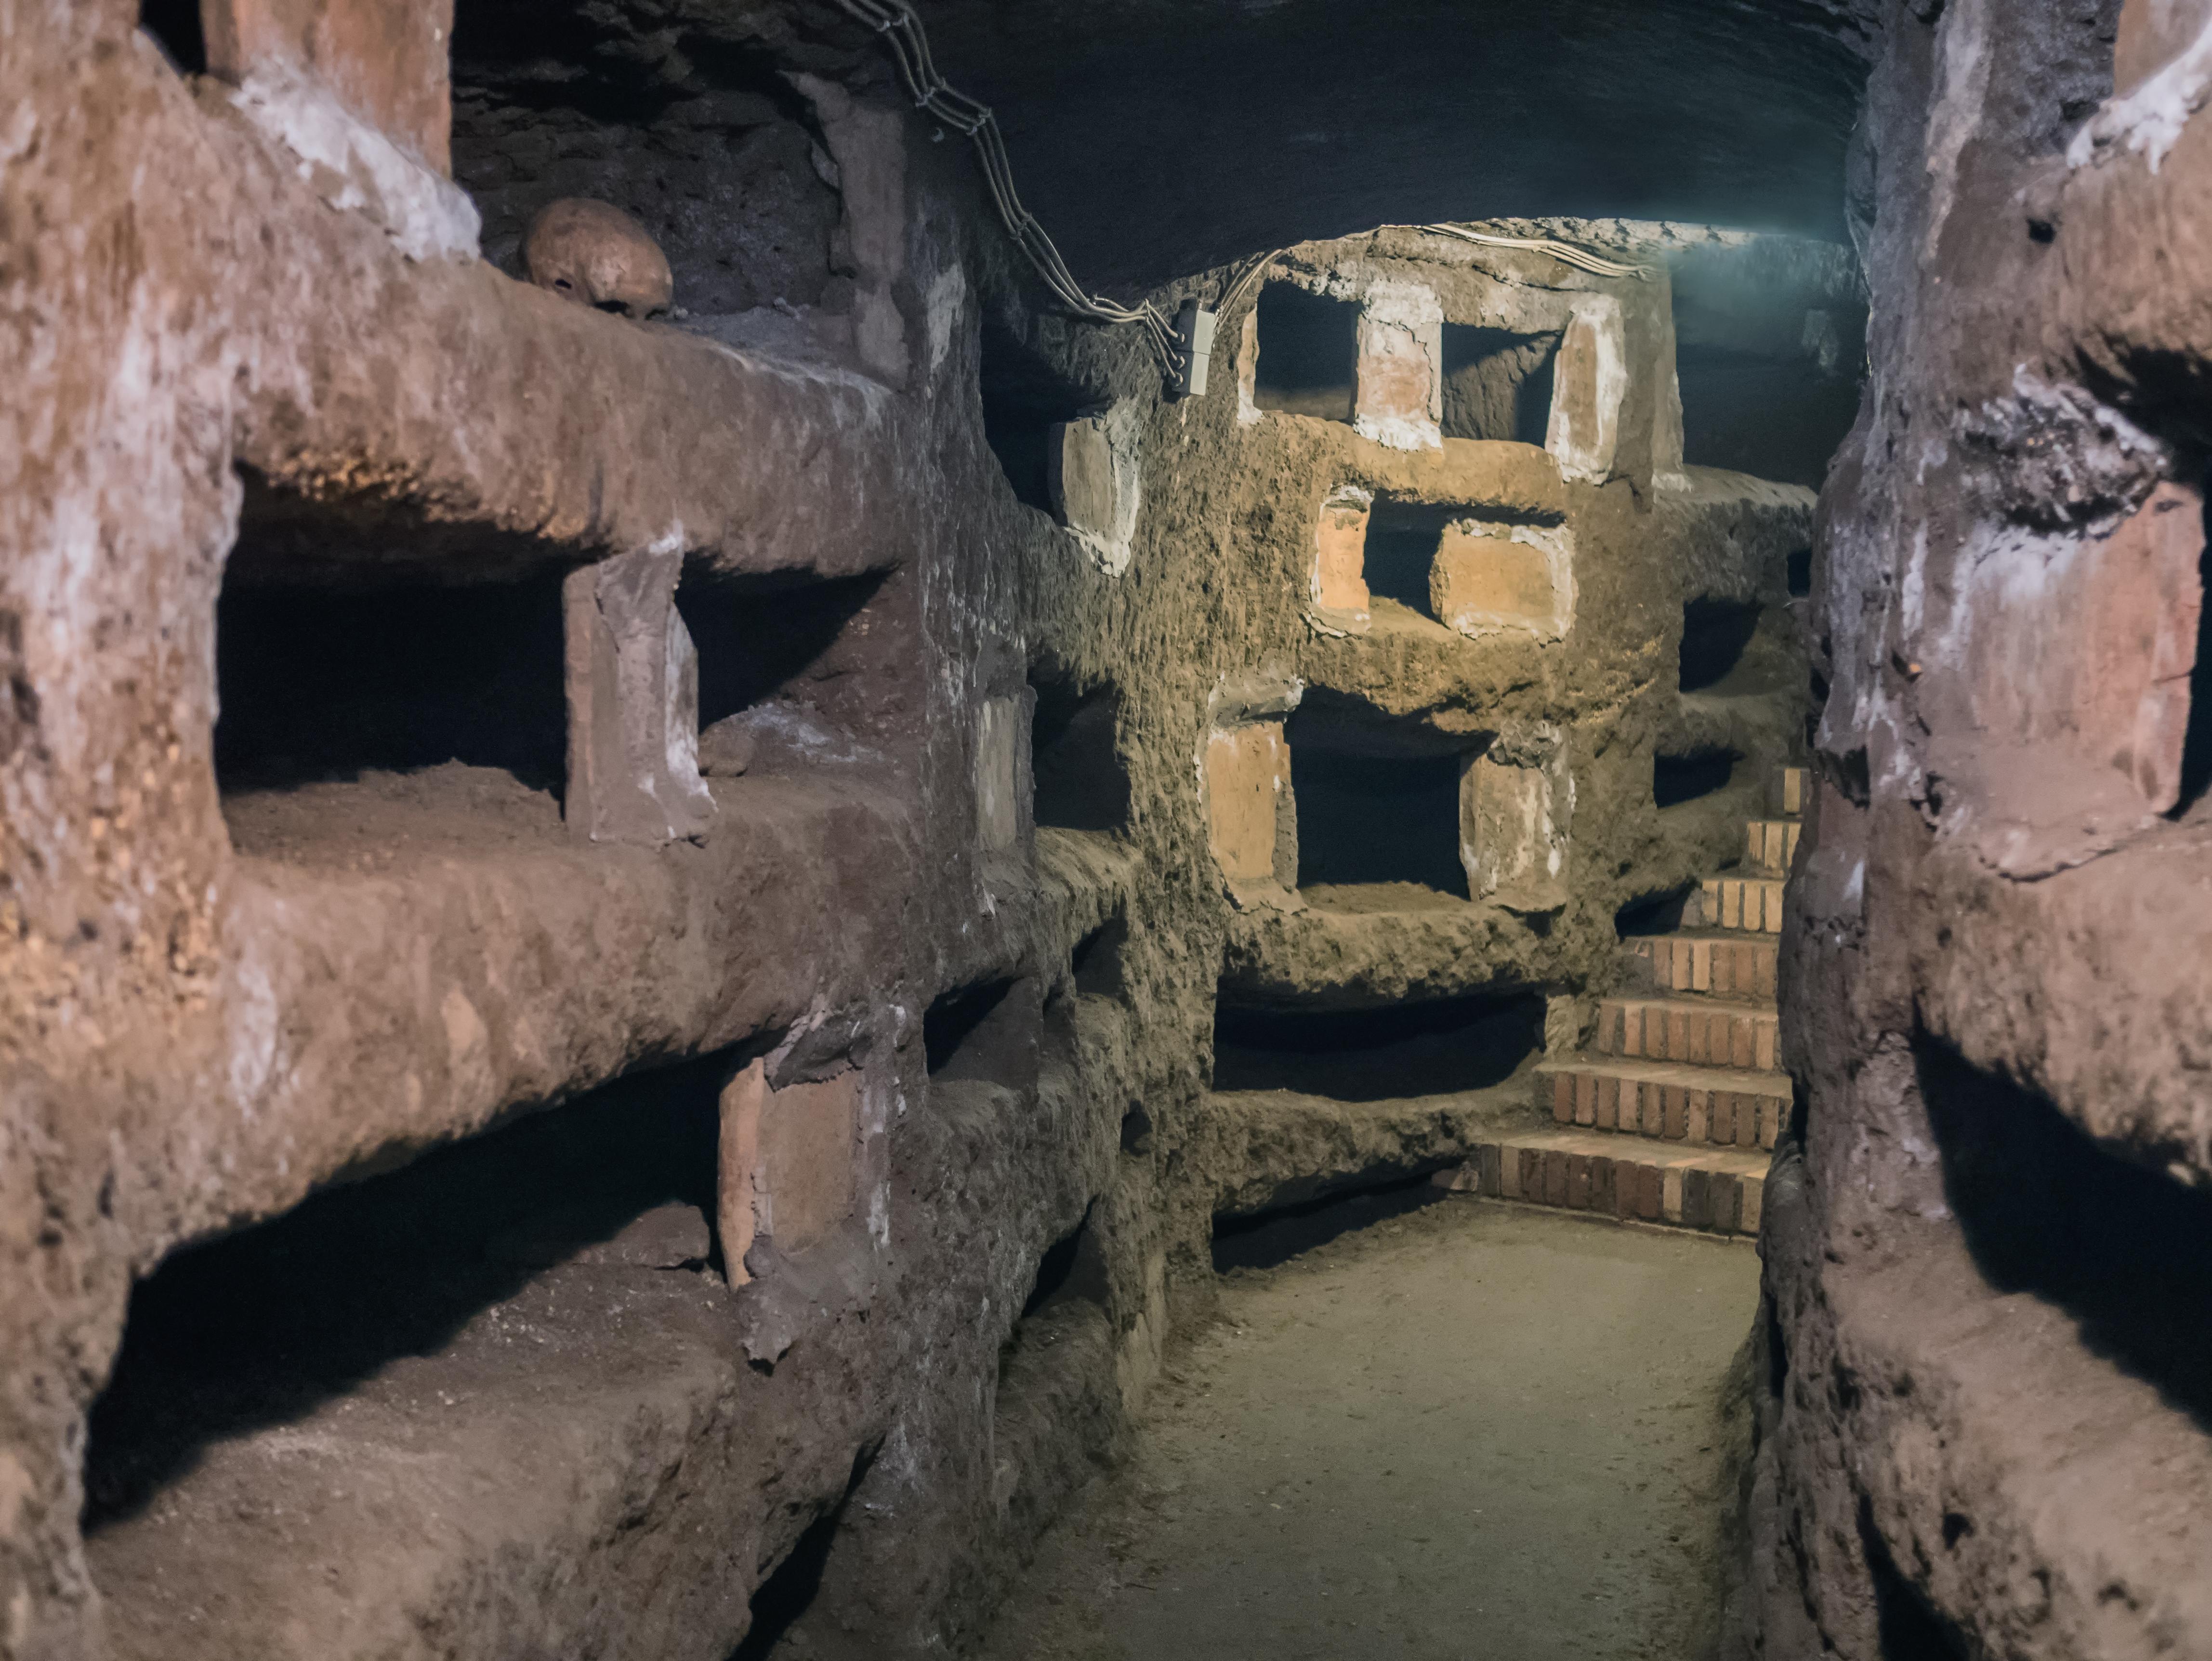 Contempla las Catacumbas de Roma - Italia Circuito Italia de Norte a Sur